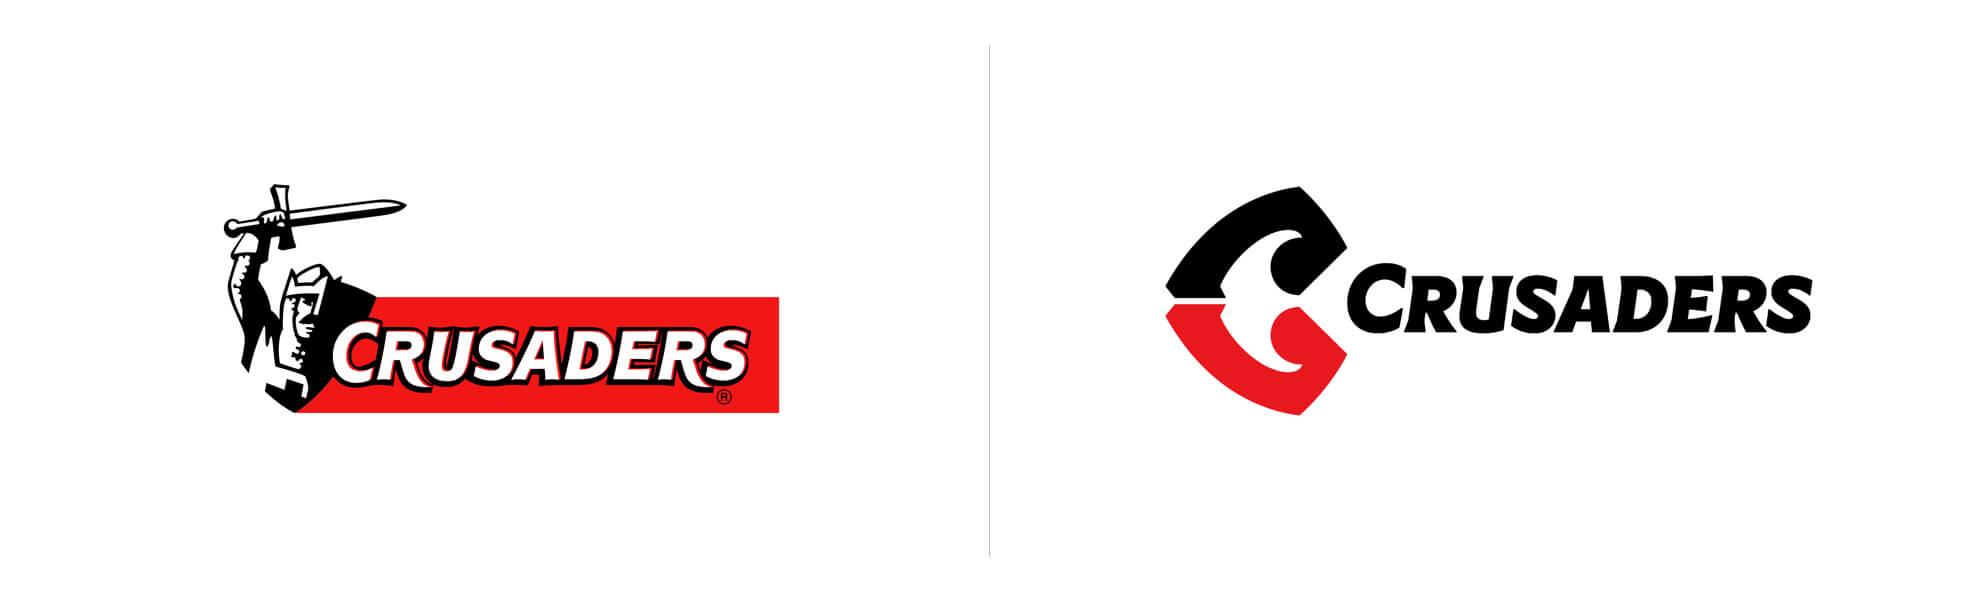 Crusaders znowym logo